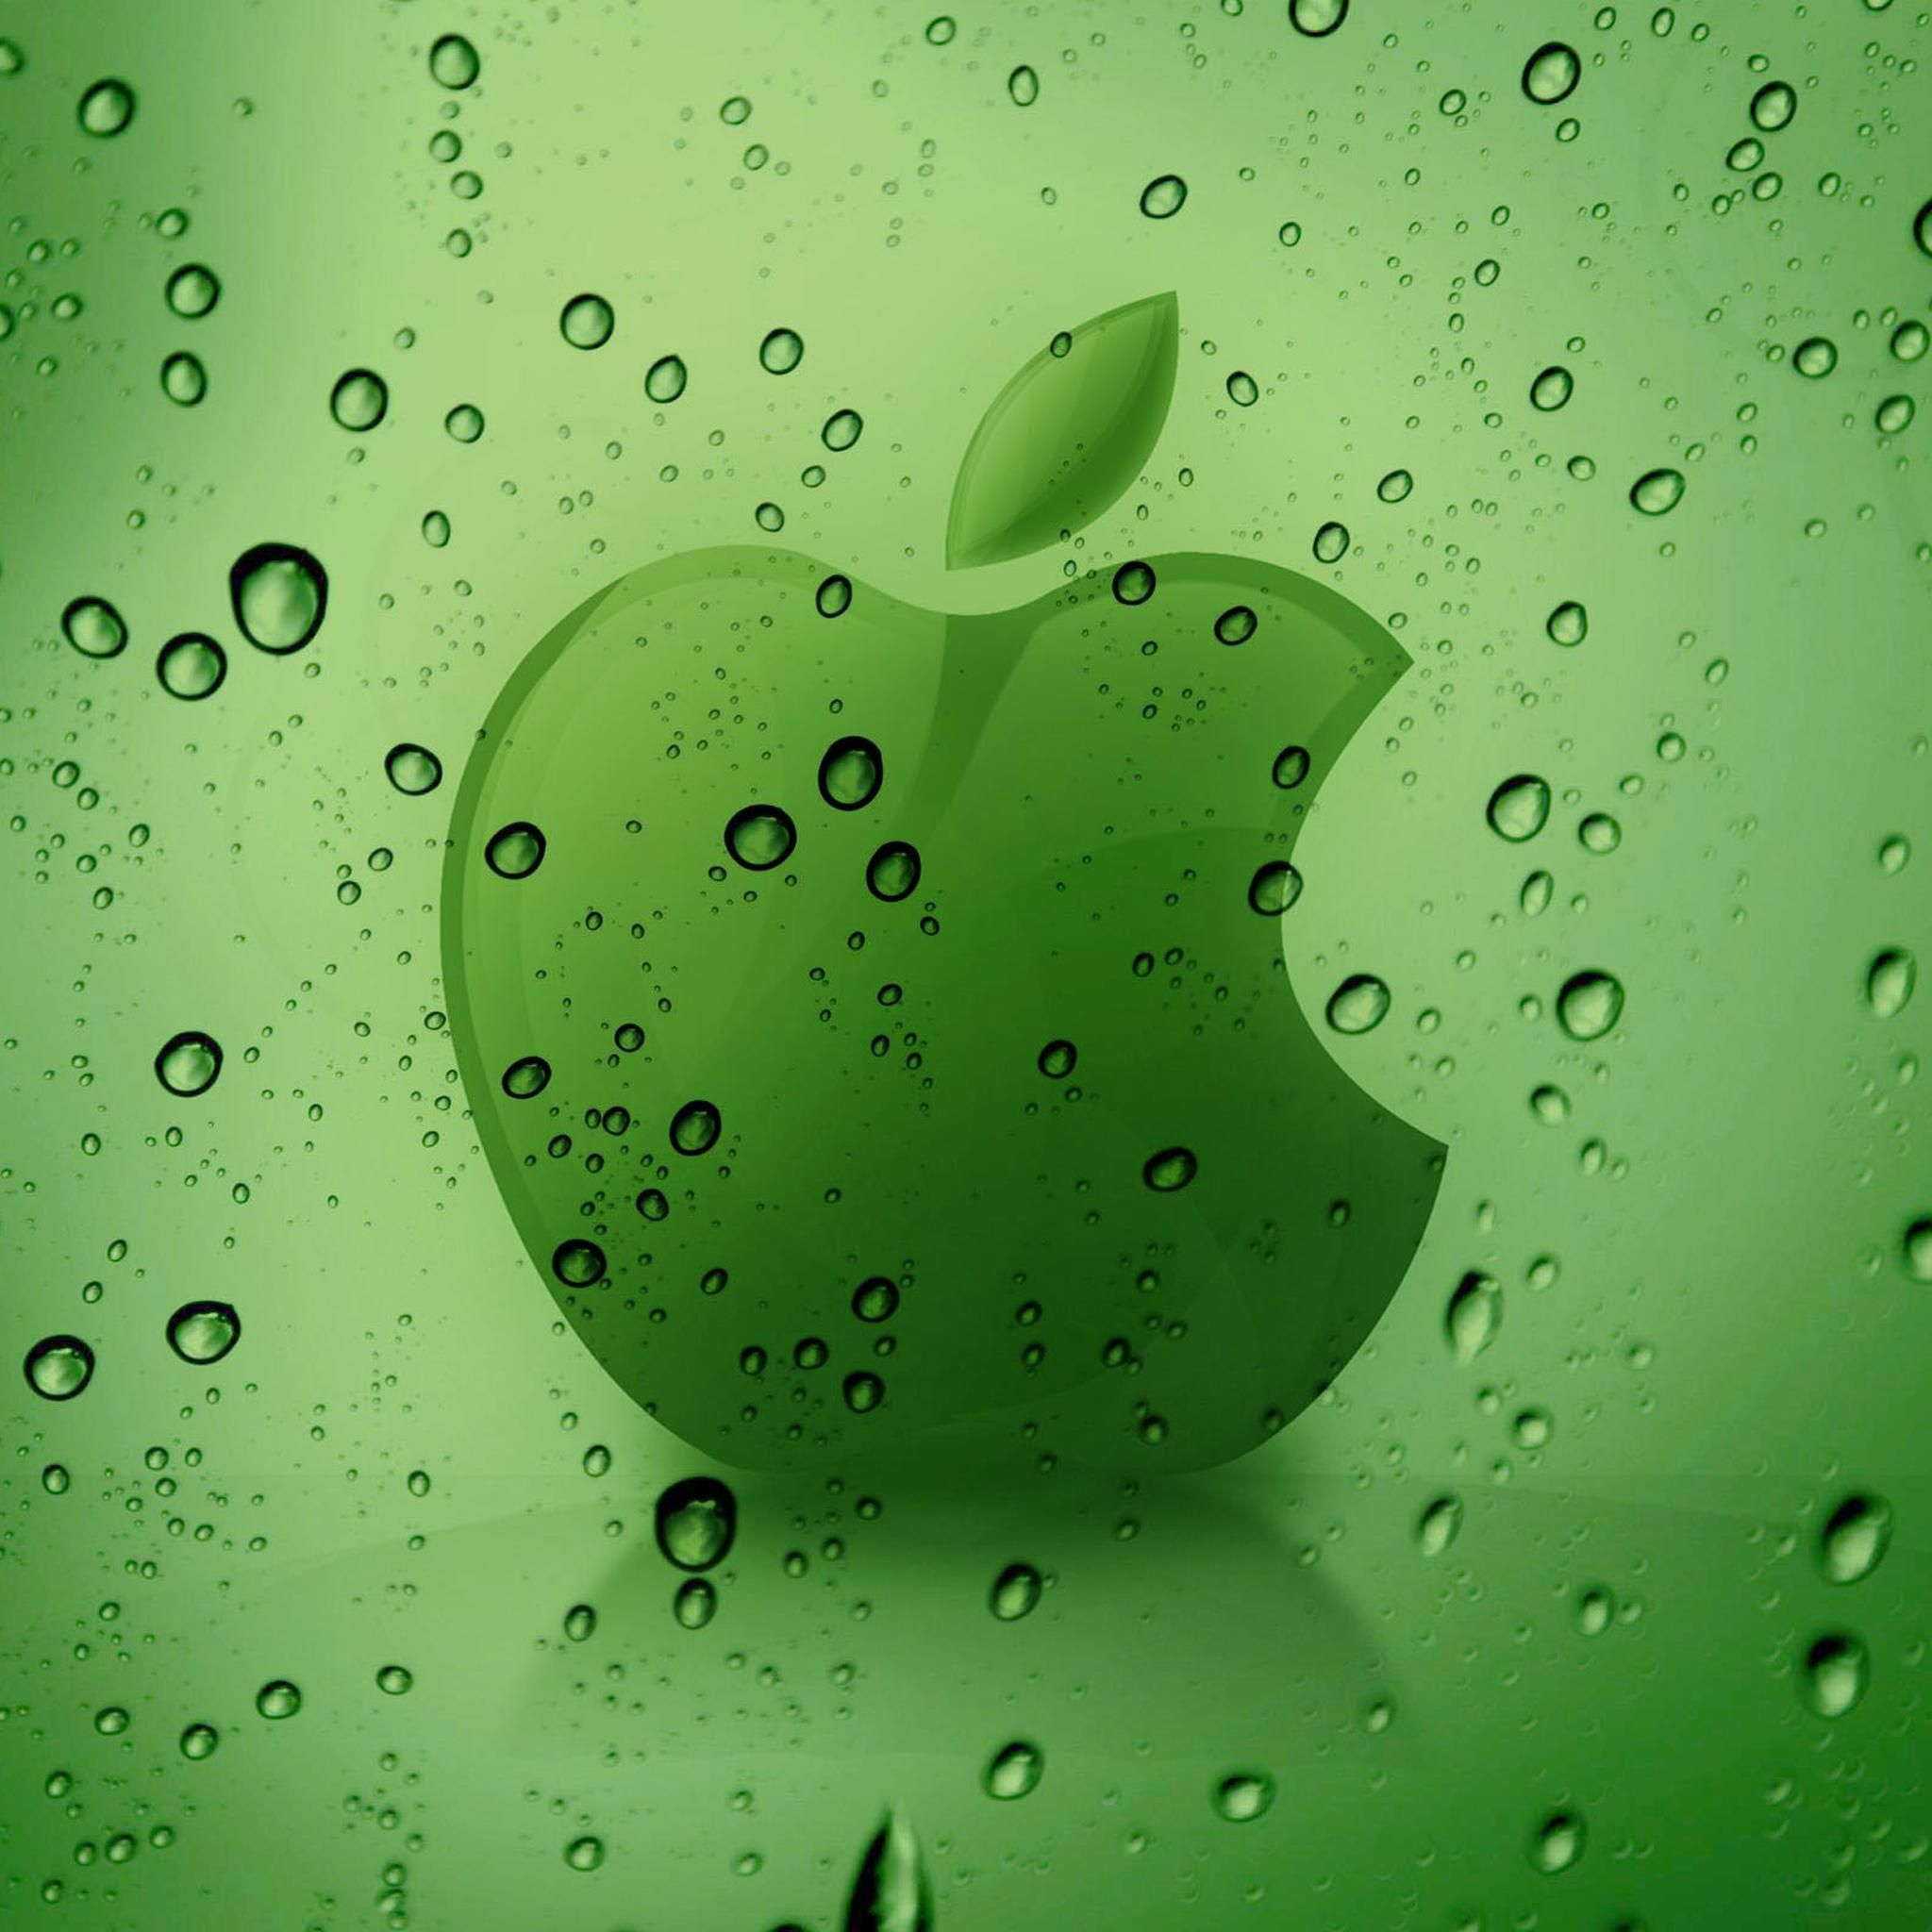 Apple Logo Behind Water Drops Retina iPad Wallpaper HD